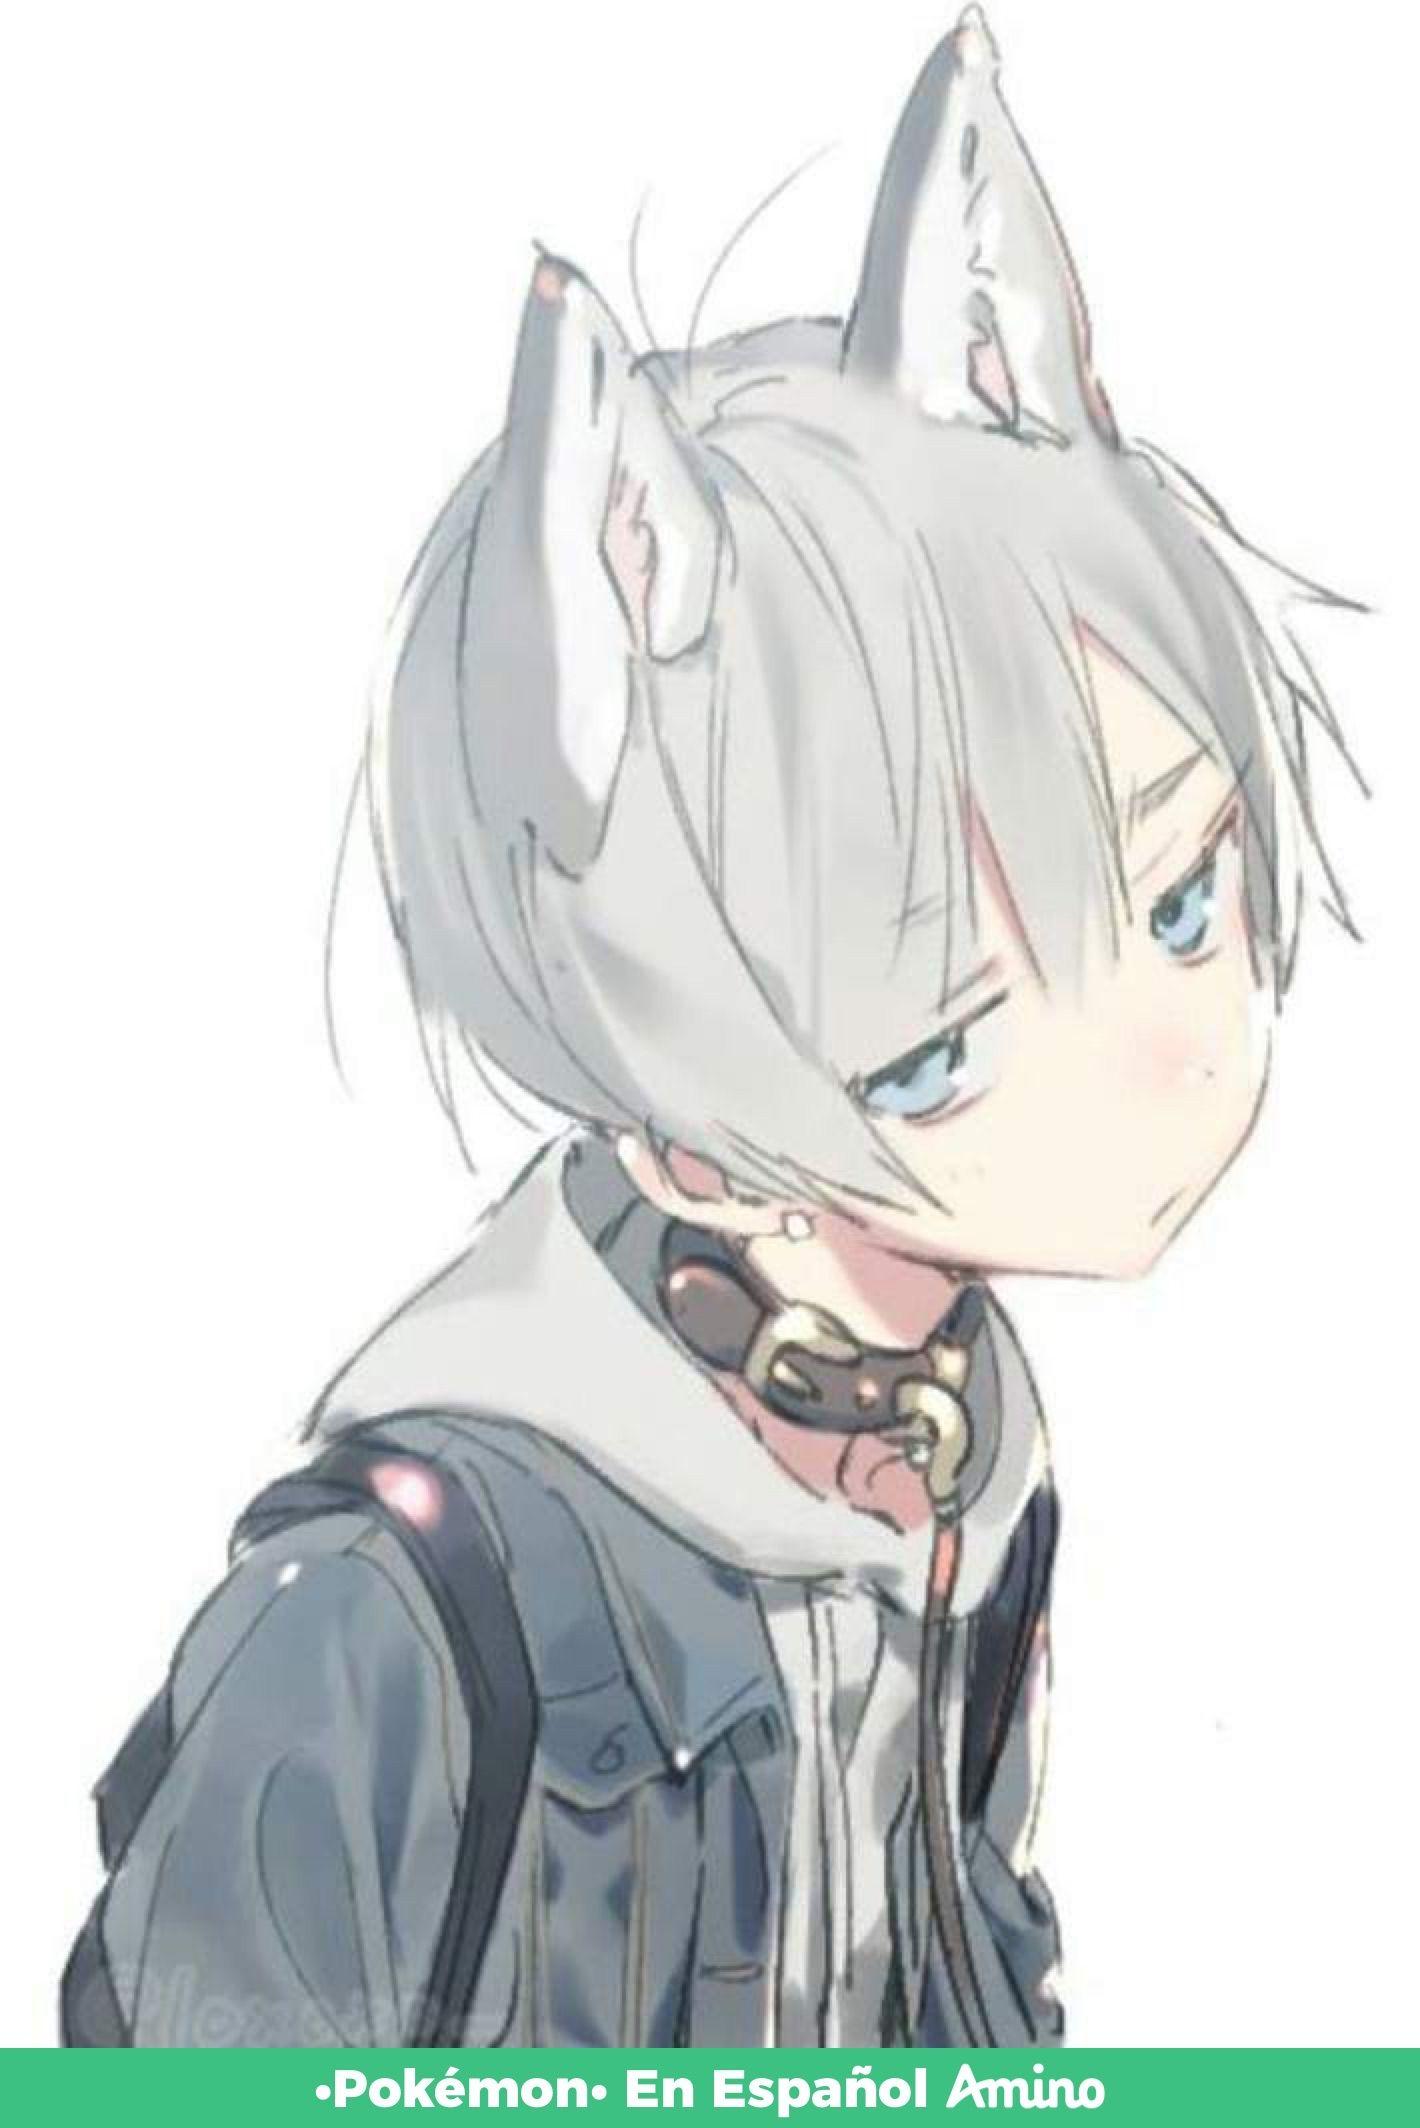 ☪ⅅℛᗅℂK ᝨℍℰ ⅅℛℰᗅℳ☪ em 2020 Garotos anime, Anime, Neko boy